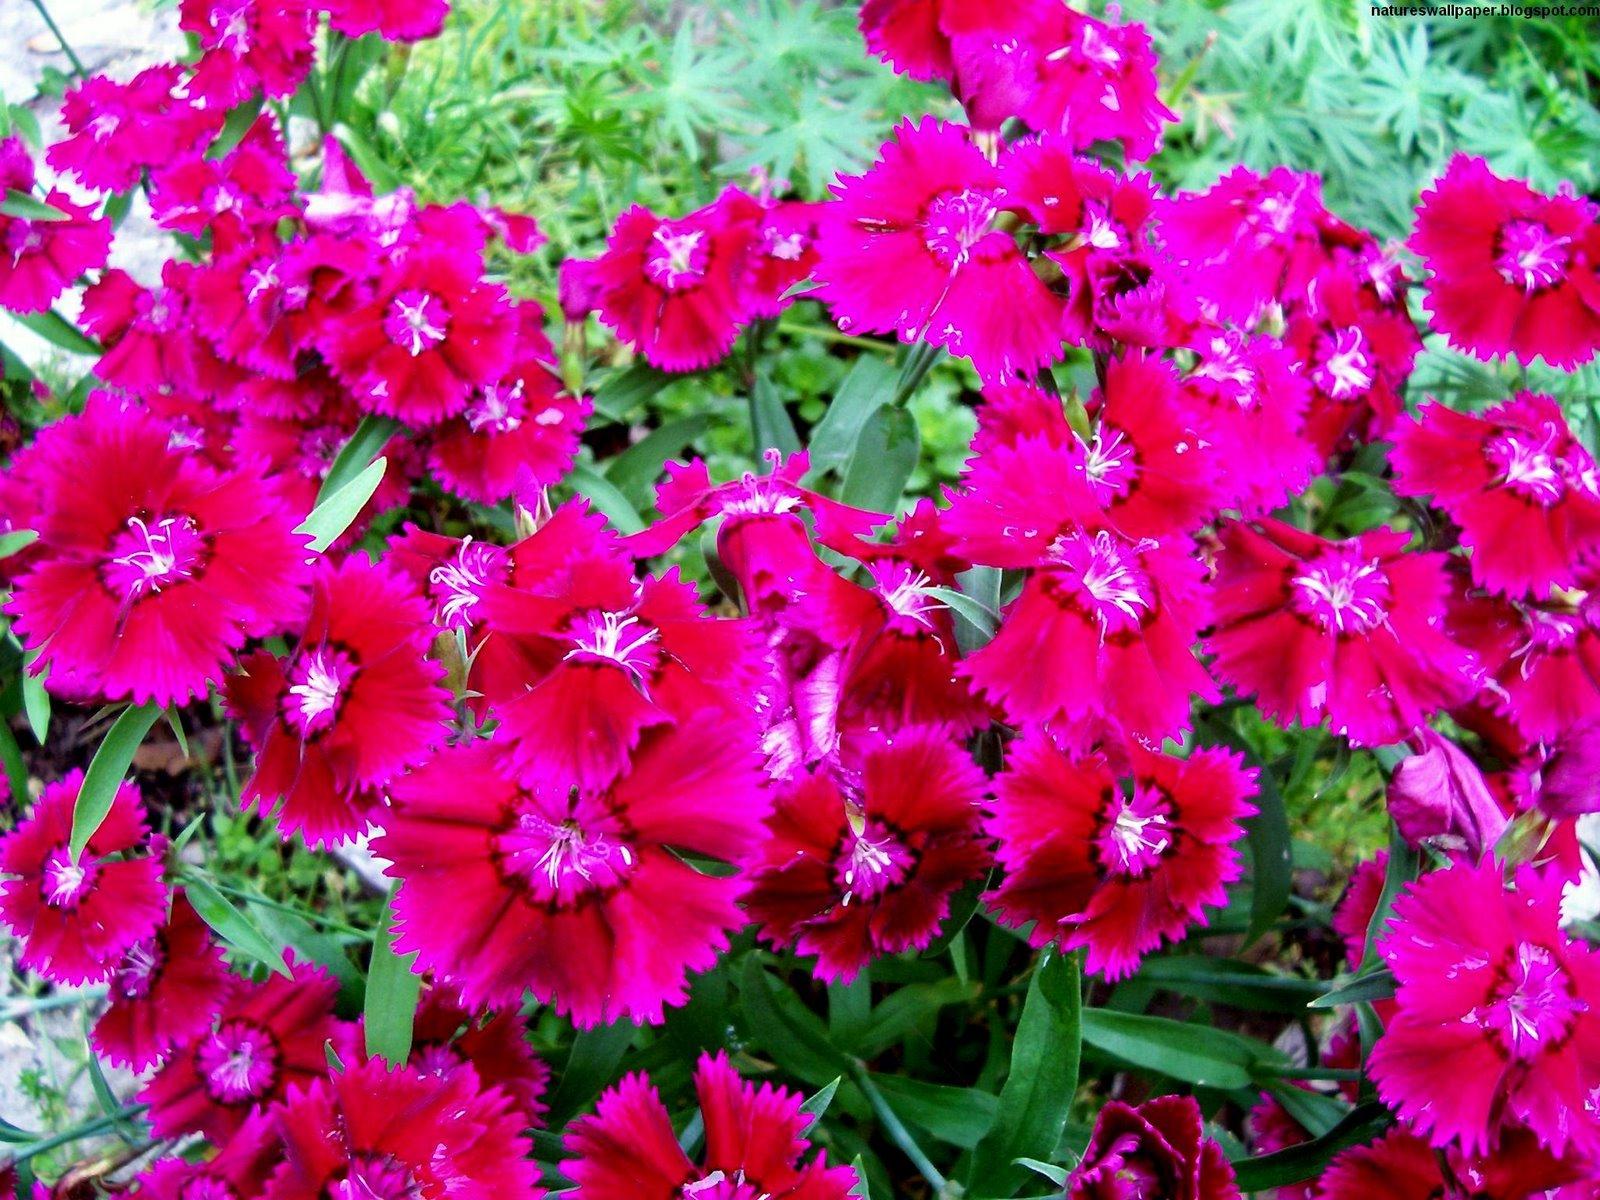 http://2.bp.blogspot.com/_ZWw3x1gj3hQ/TM7t0zUKEyI/AAAAAAAAJ-M/AVBogzhHyIo/s1600/Flowers,+plants,+Red,+wallpaper.jpg